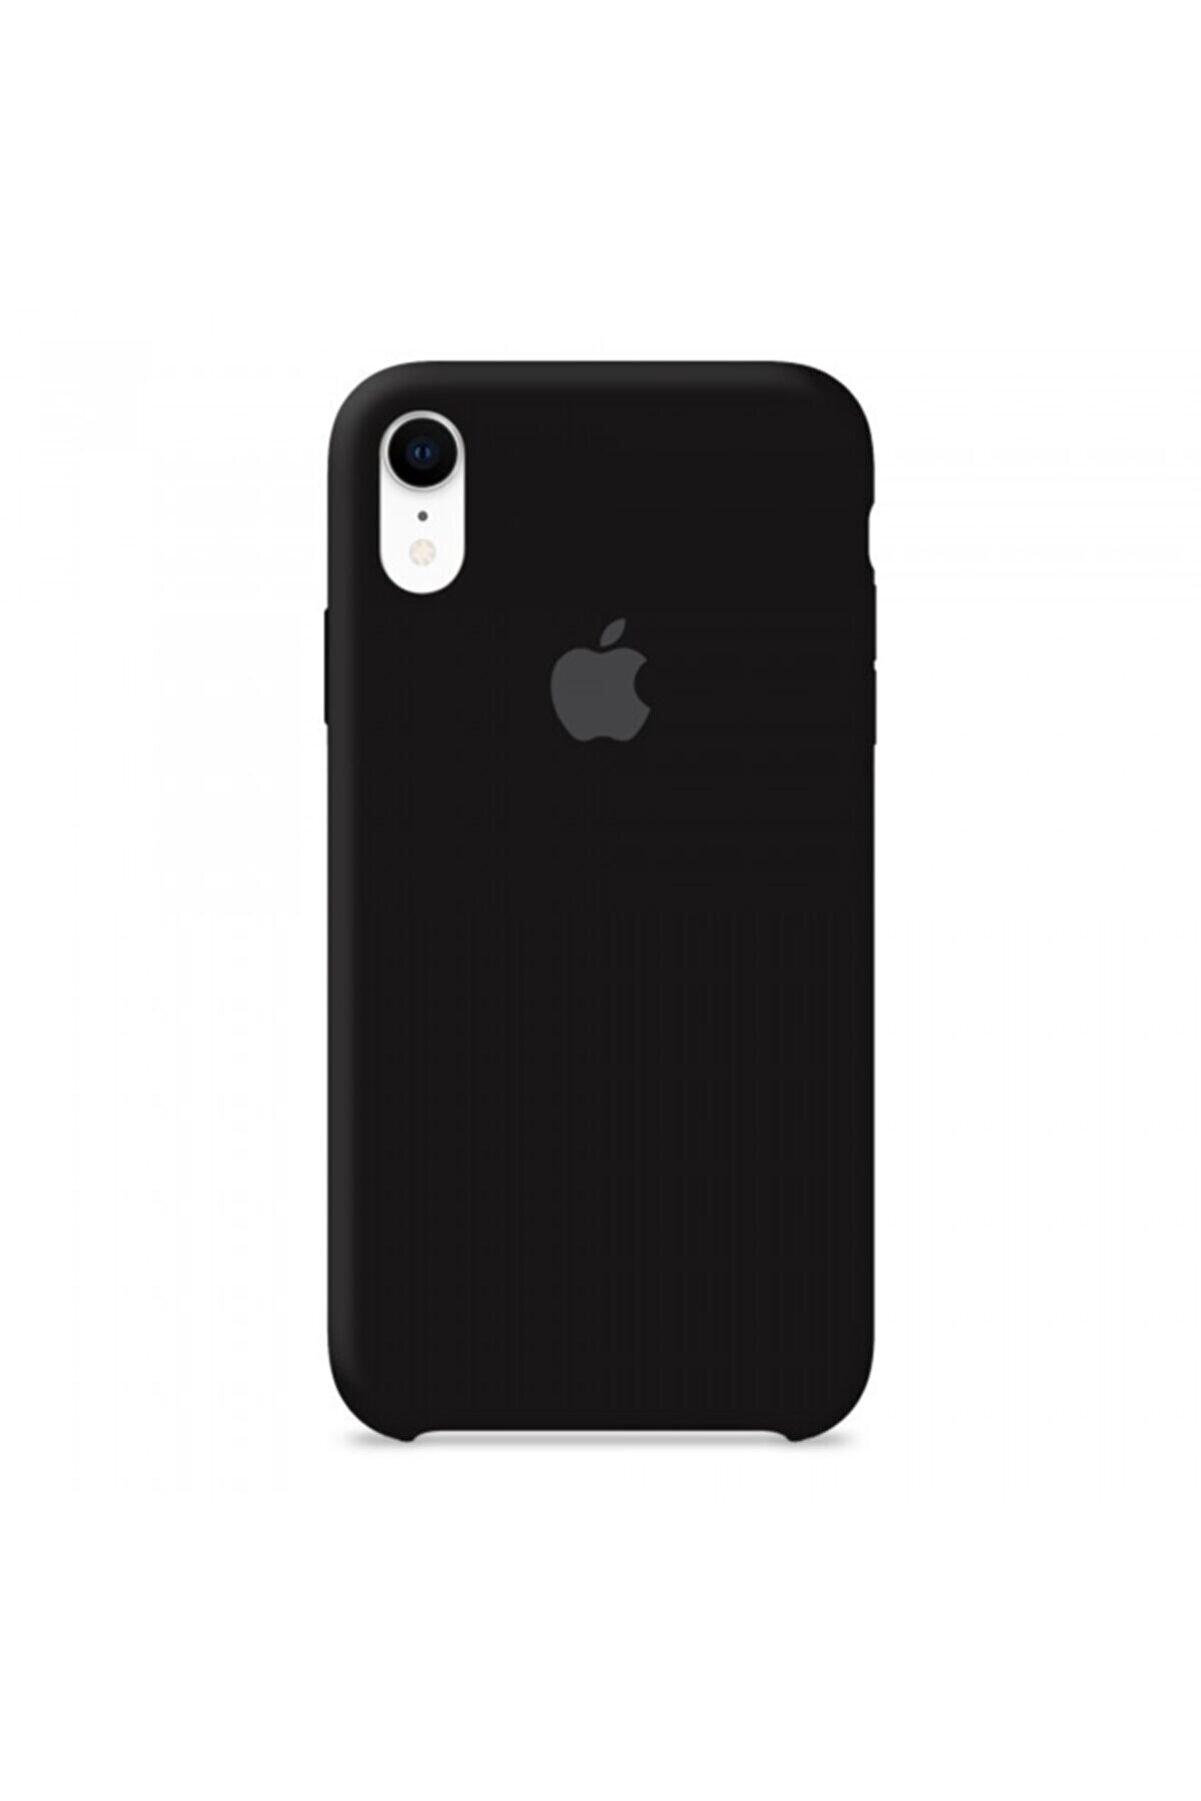 ERETNA STORE Iphone Xr Uyumlu Silikon Kılıf Siyah